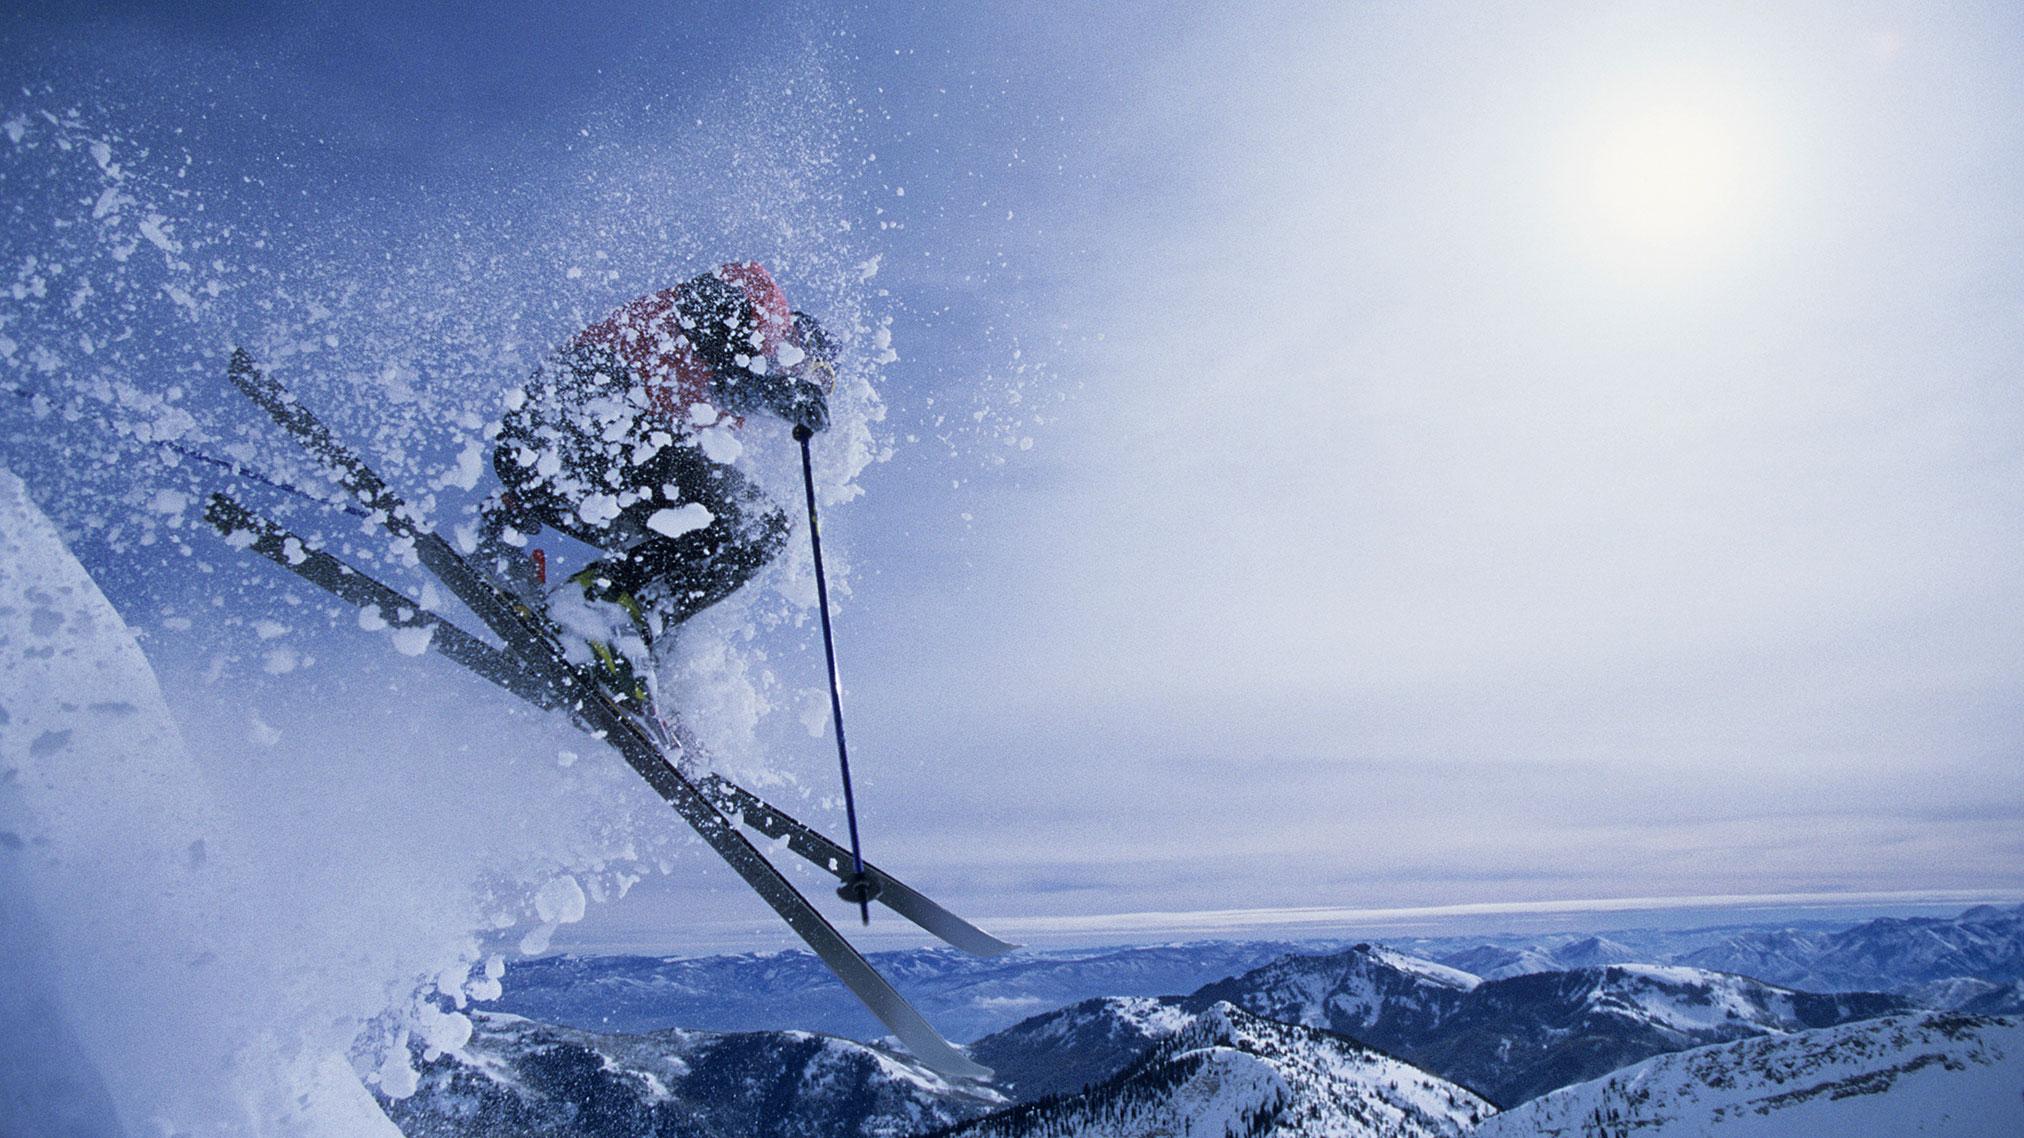 FokusWinterguide-Chronicle-Skiër